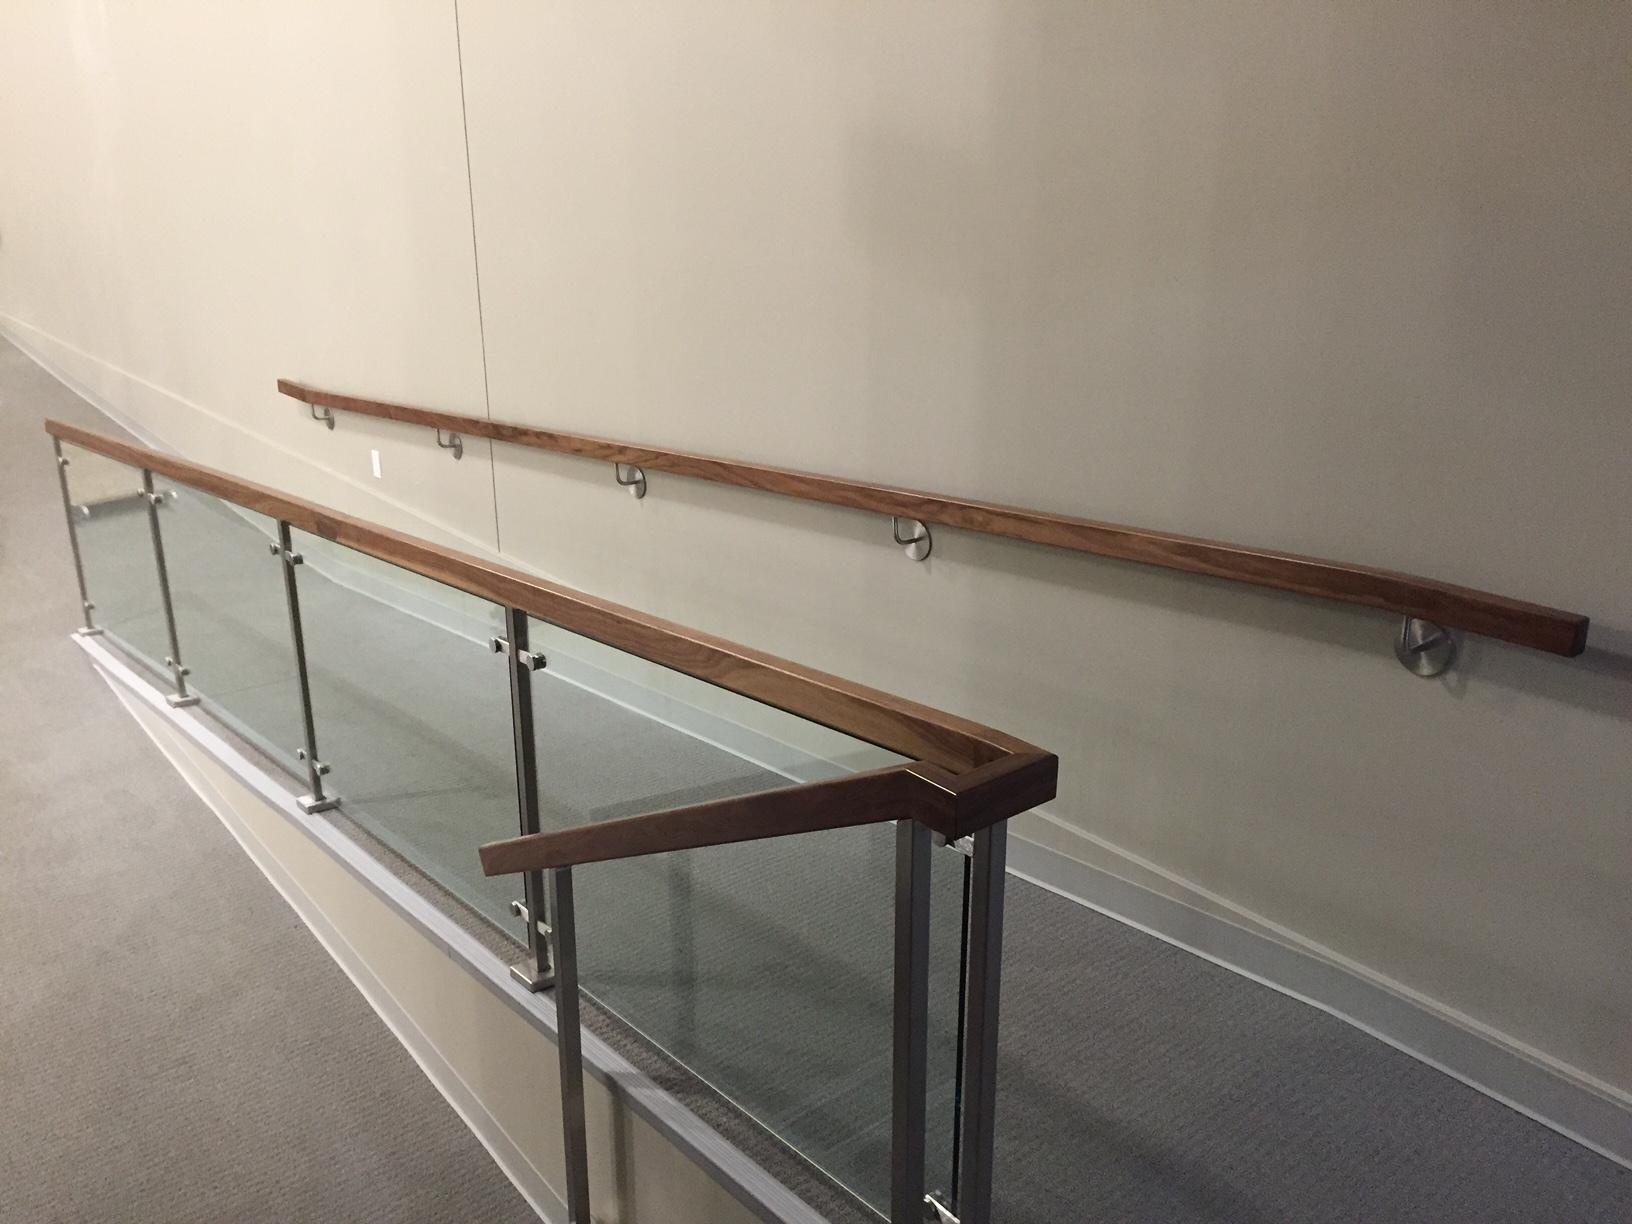 Handrail 7 Yes